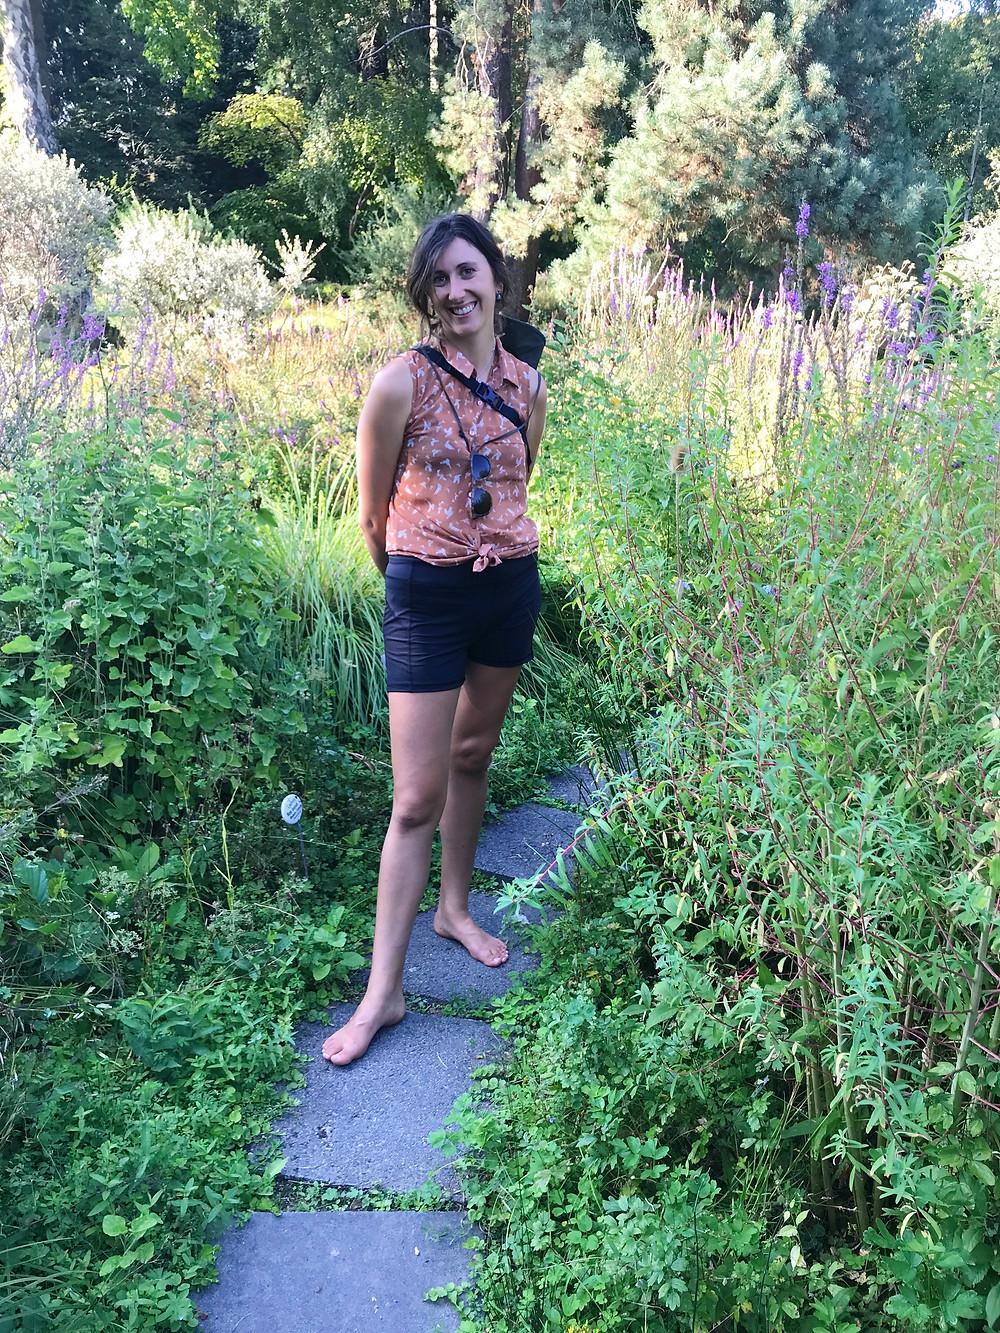 Barefoot woman at the Frankfurt Botanical Gardens.